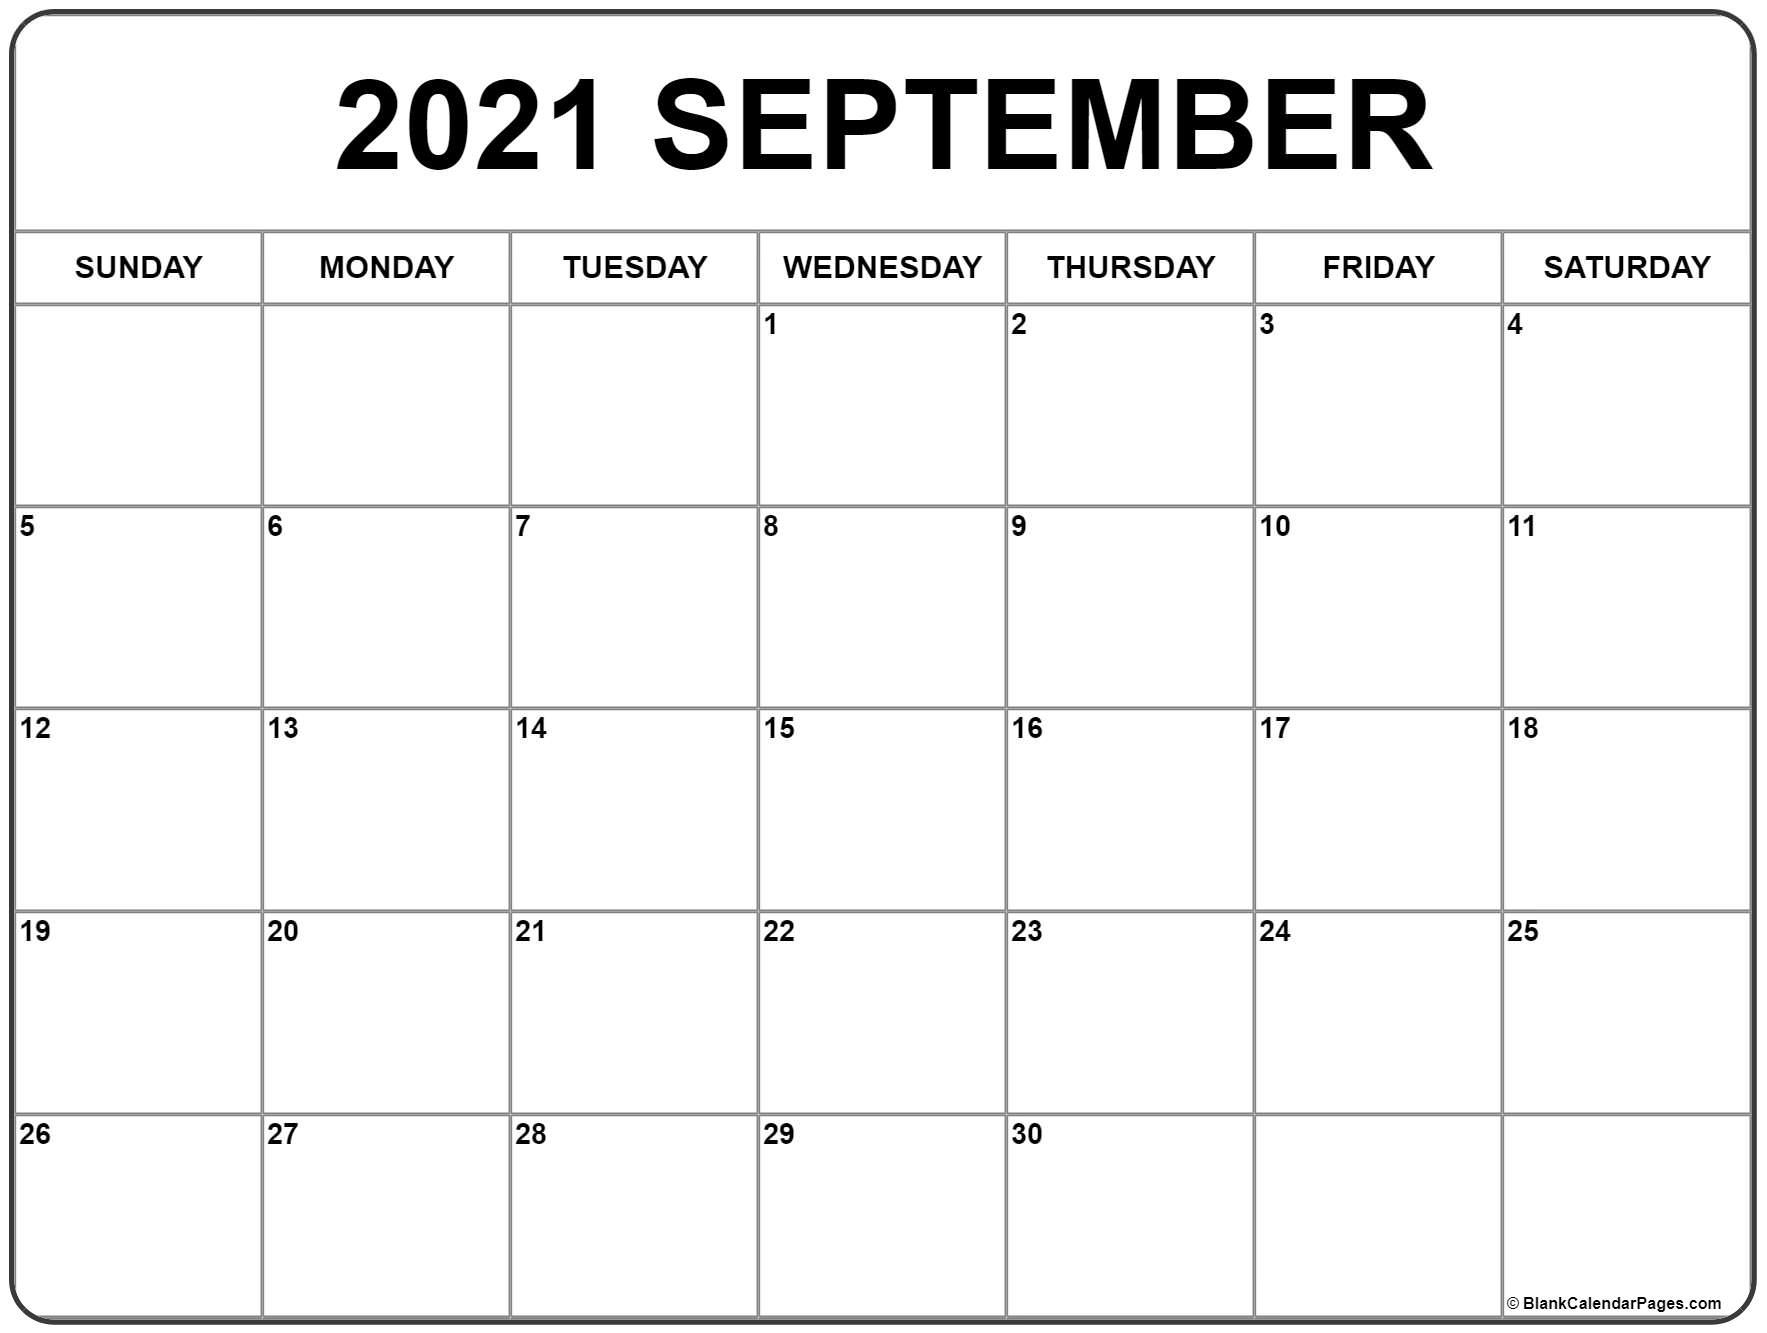 September 2021 Calendar | Free Printable Monthly Calendars